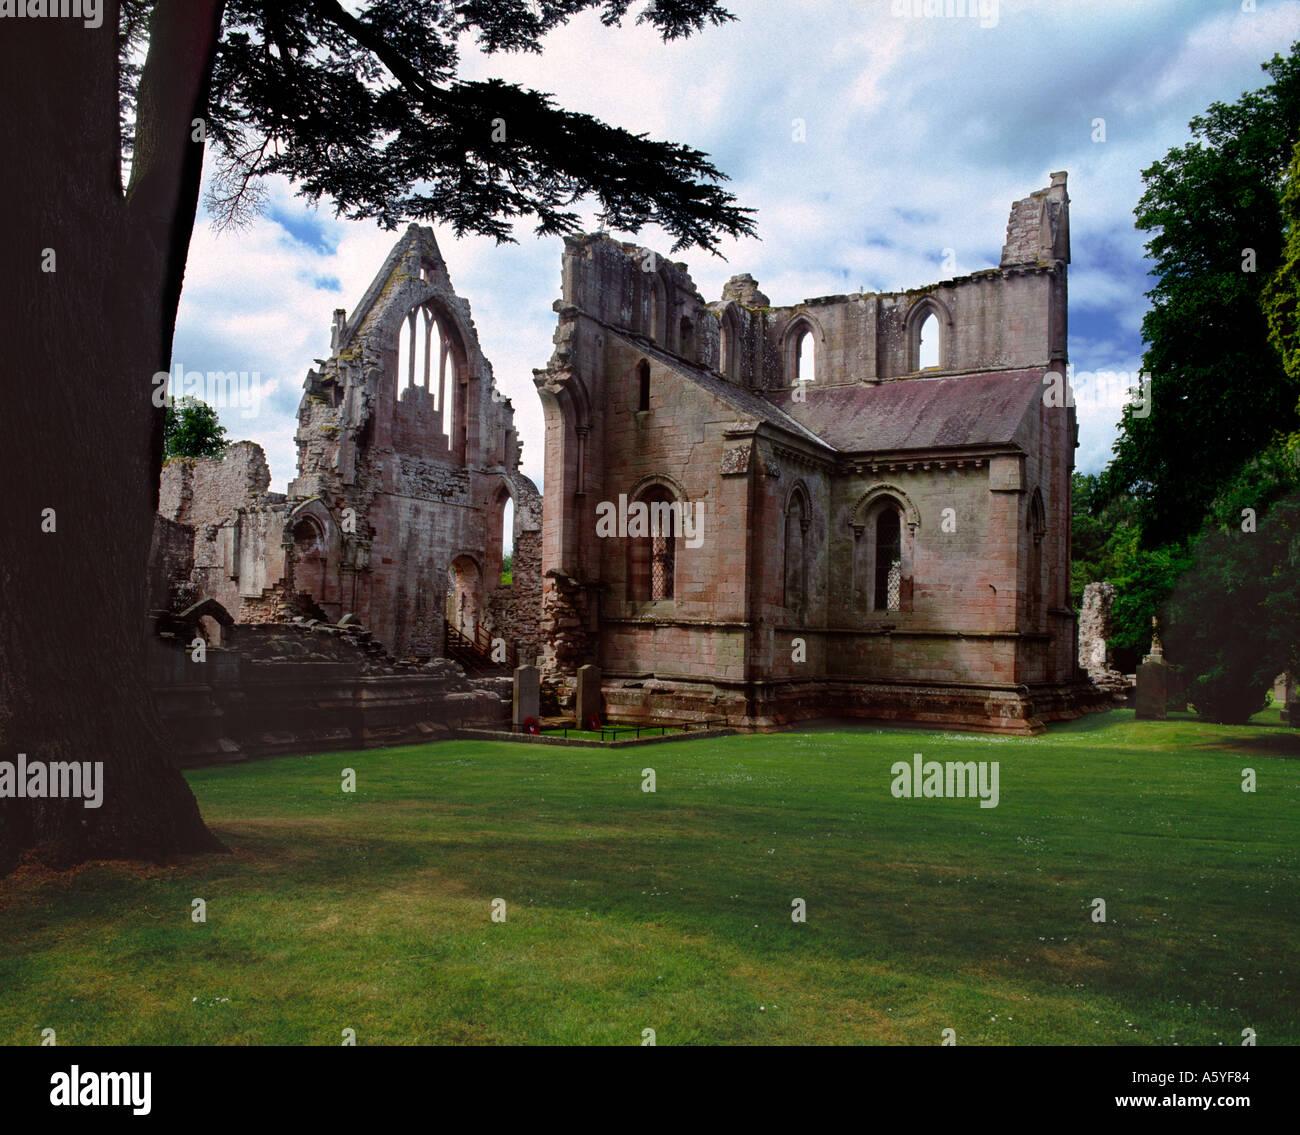 Dryburgh Abbey, Scottish Borders - Stock Image